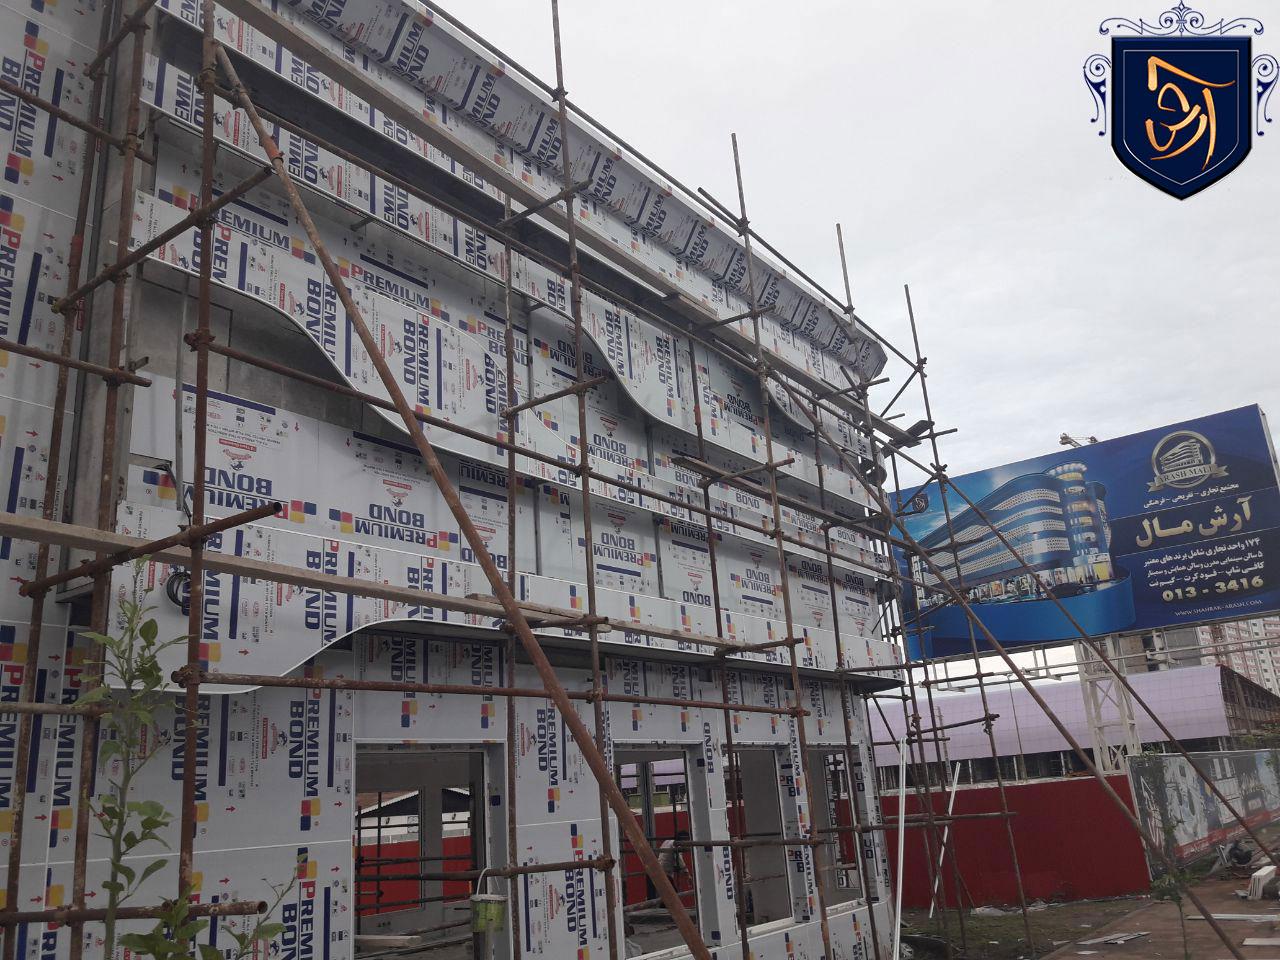 new2 - مراحل پایانی احداث ساختمان اداری آرش مال منطقه آزاد انزلی